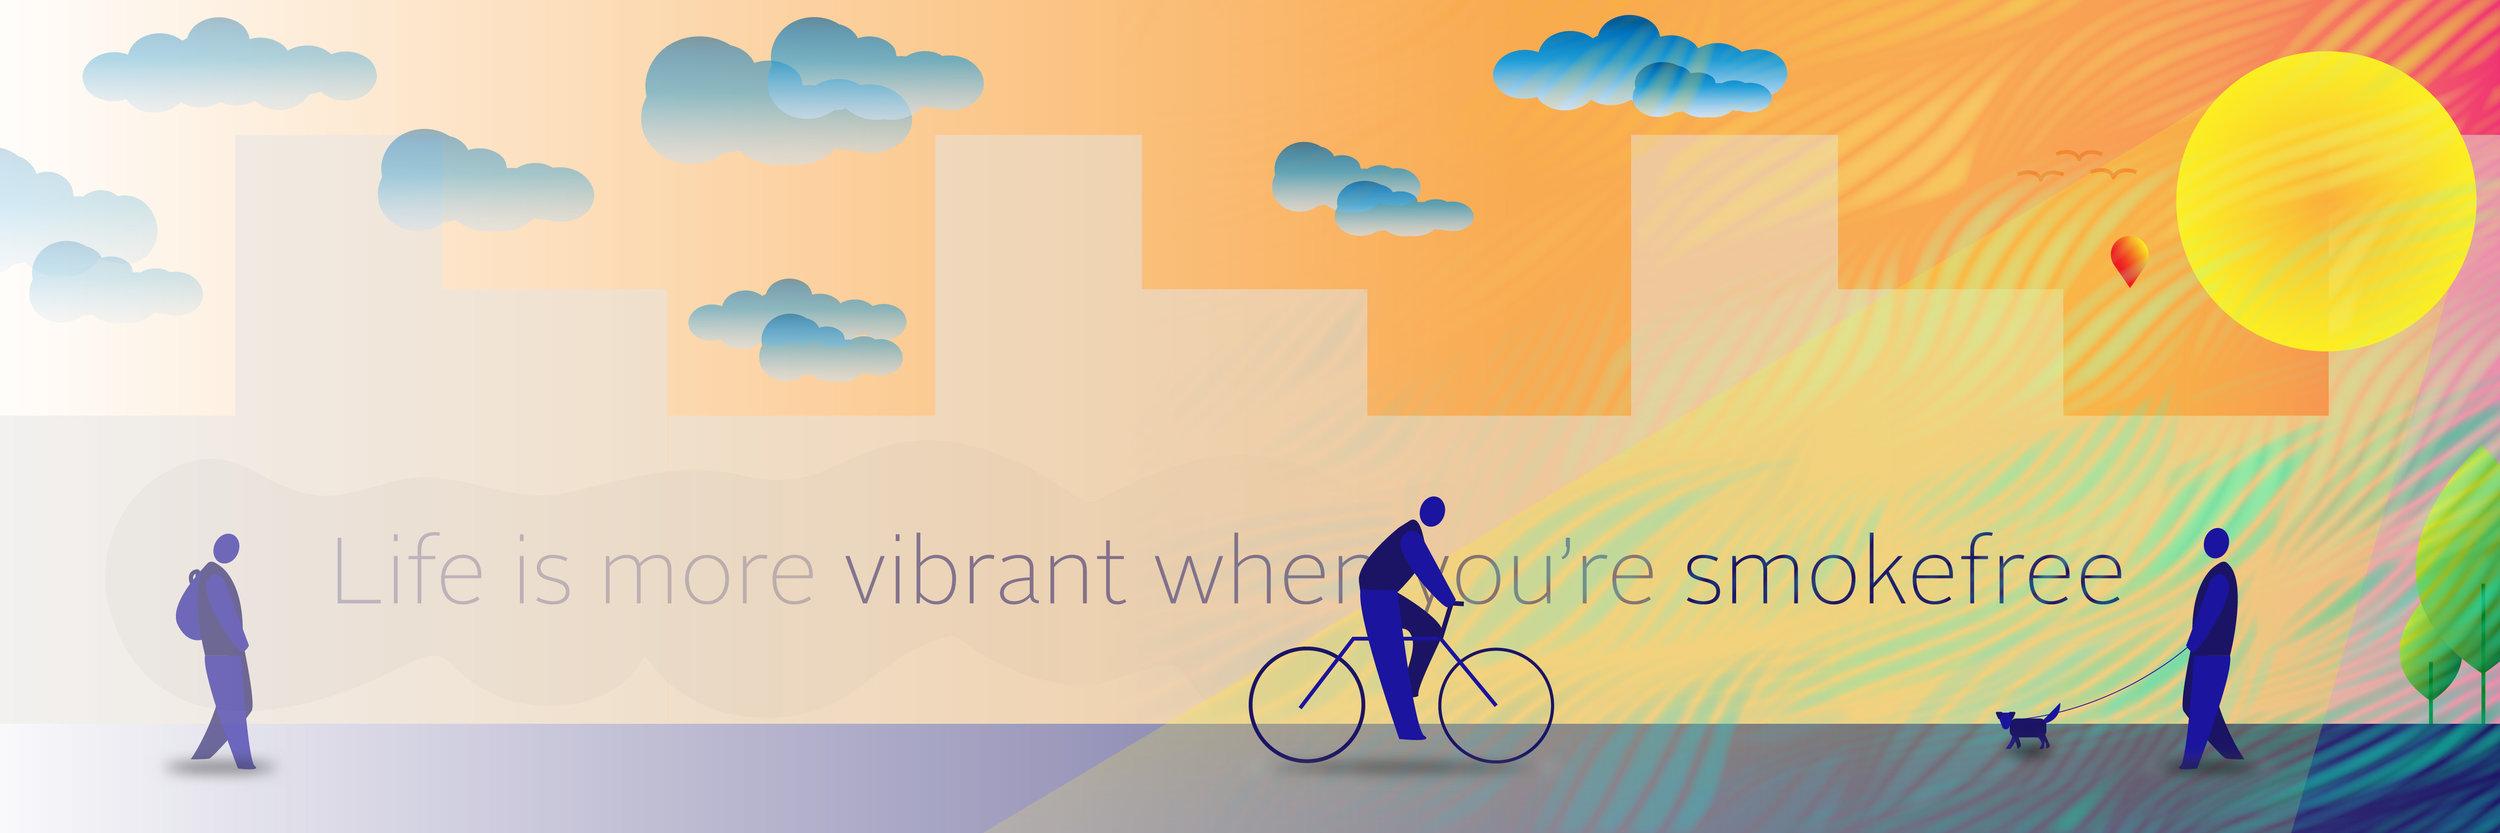 12330_Smokefree_Social_Vibrant_Life_v2Artboard 1.jpg